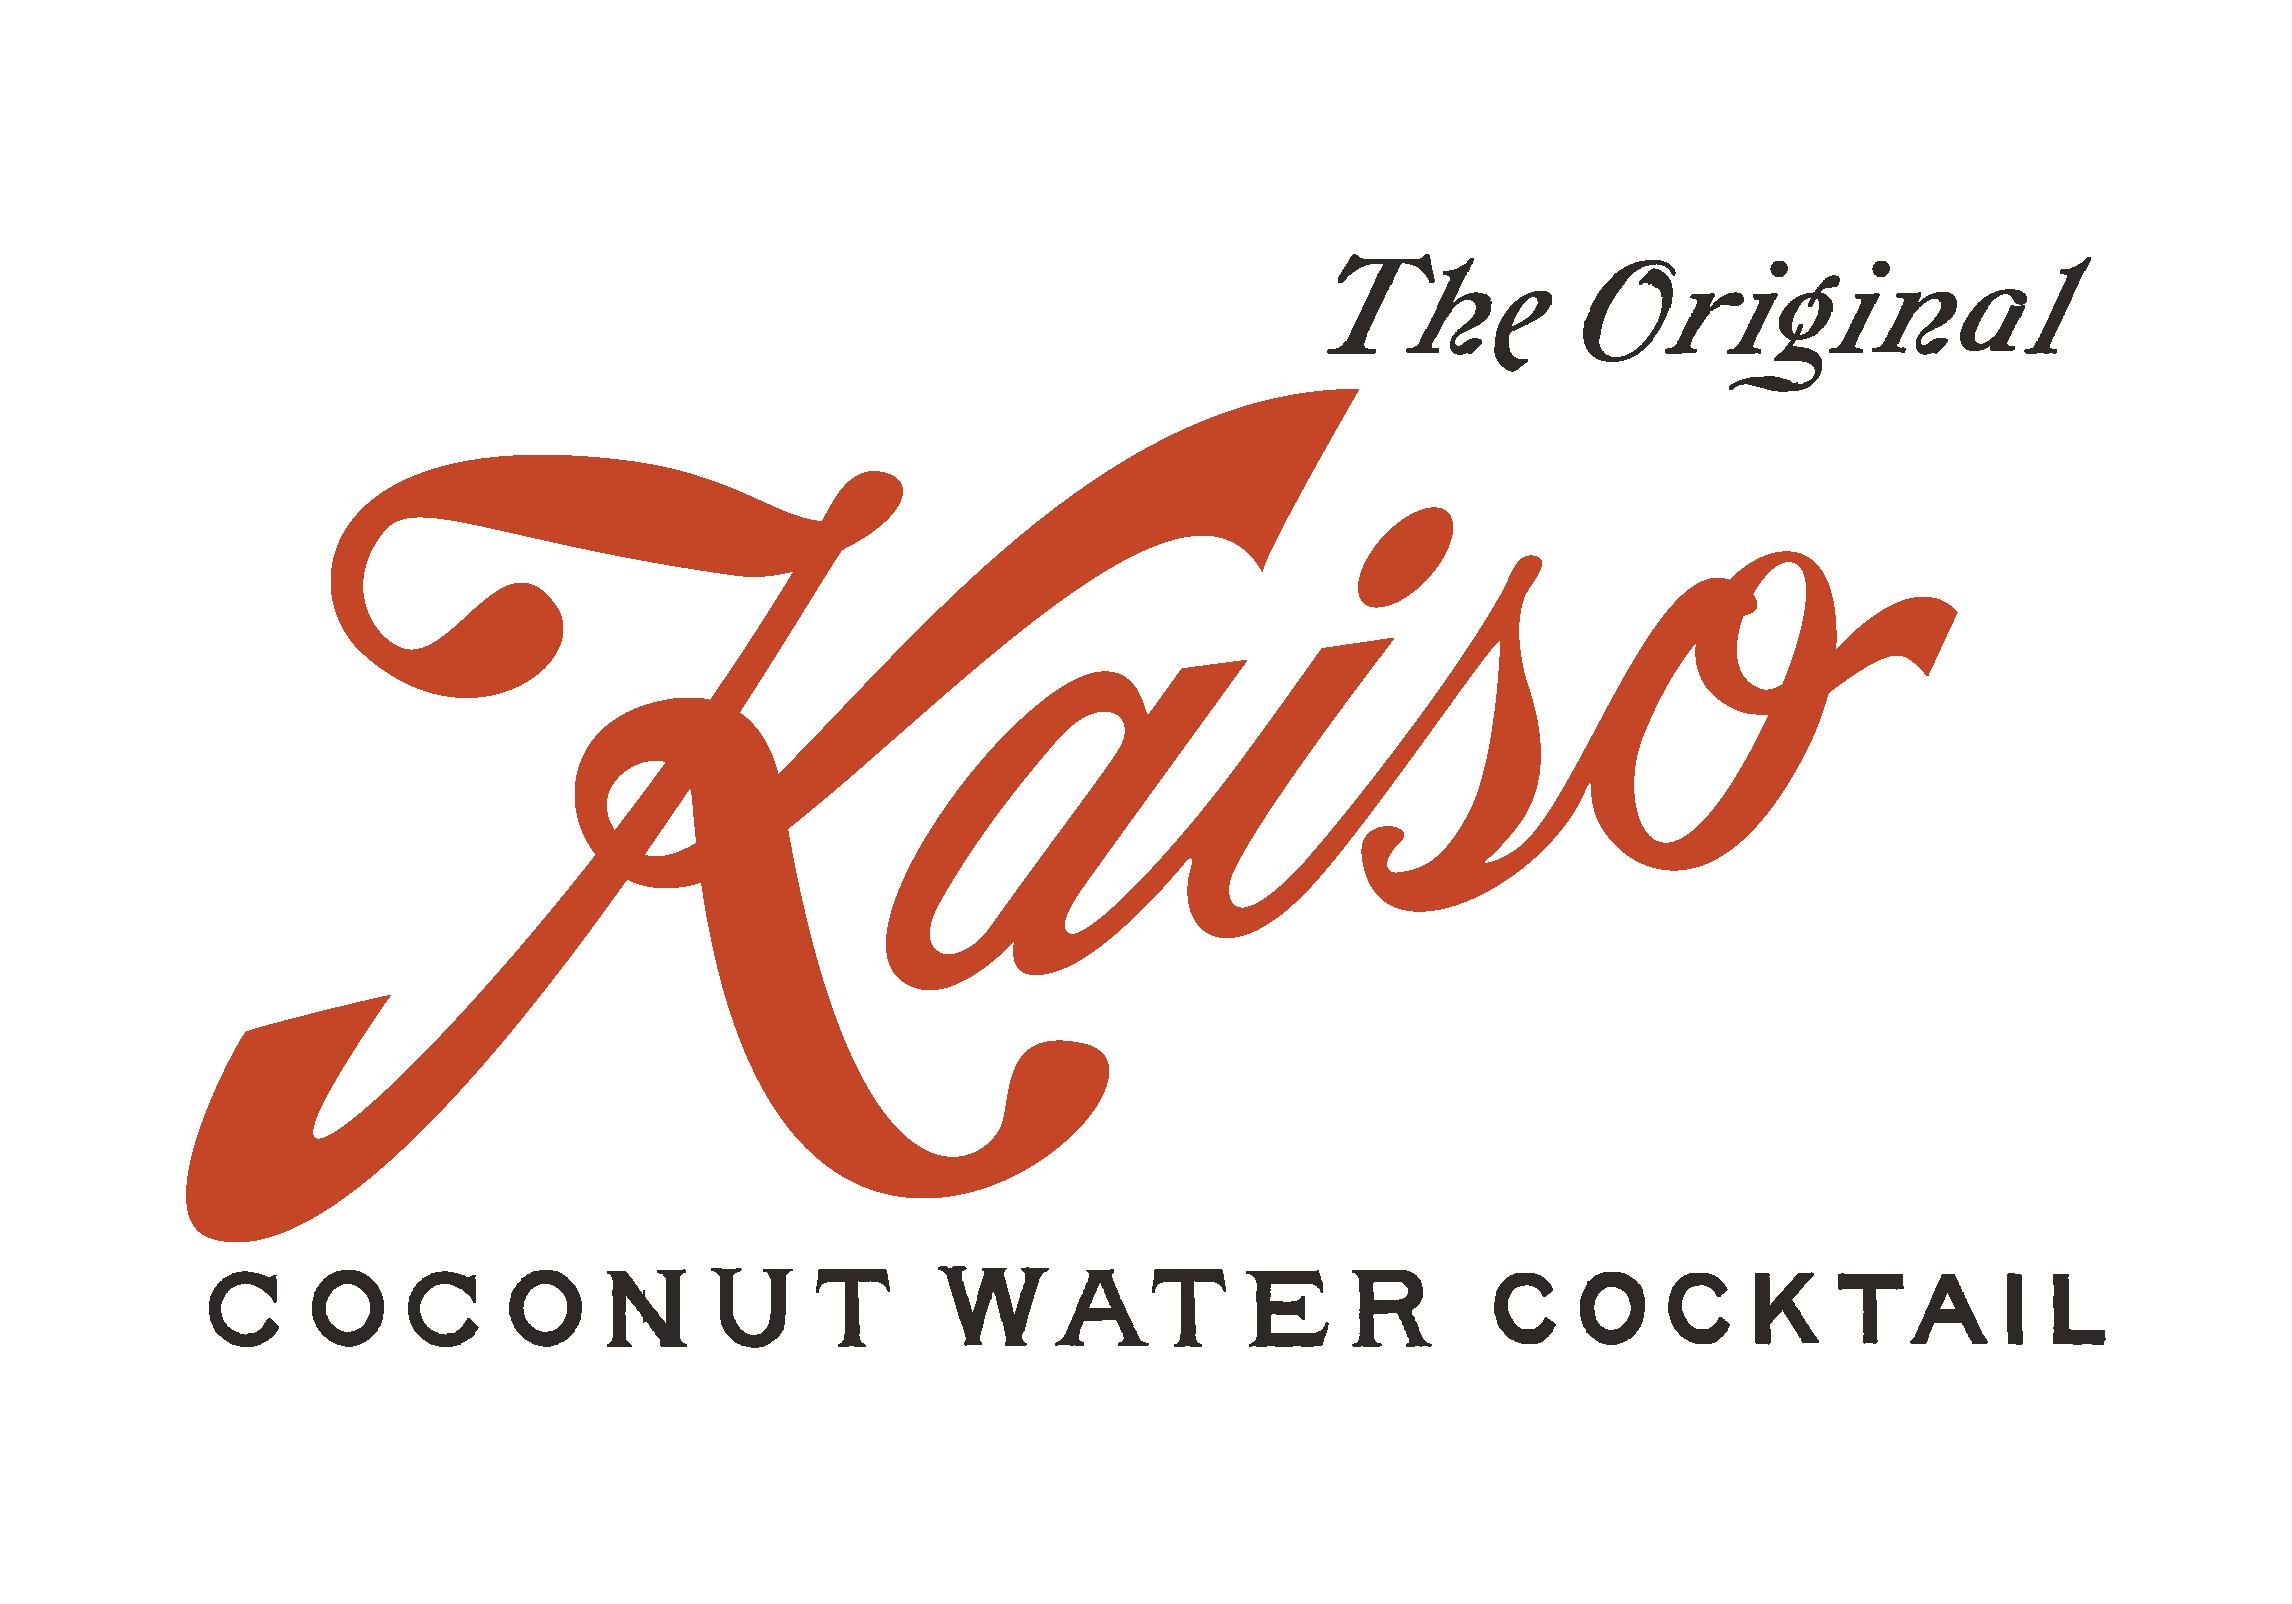 KAISO Original Coconut Water Cocktail